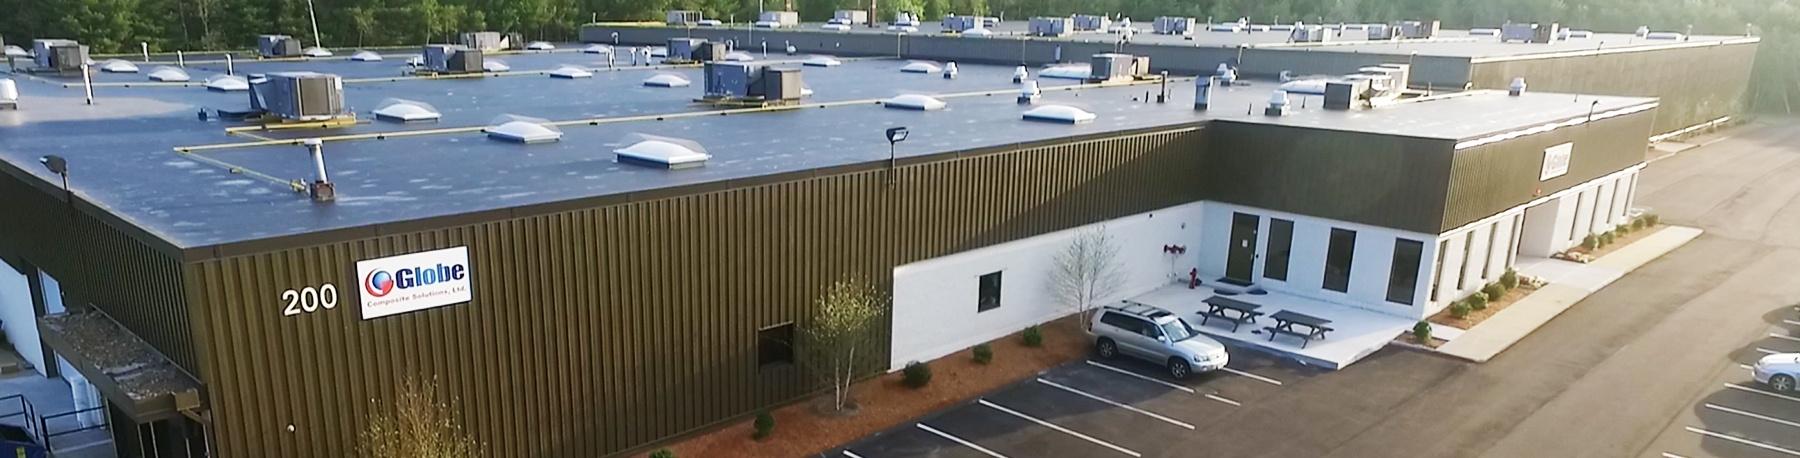 globe-composite-building-exterior.jpg